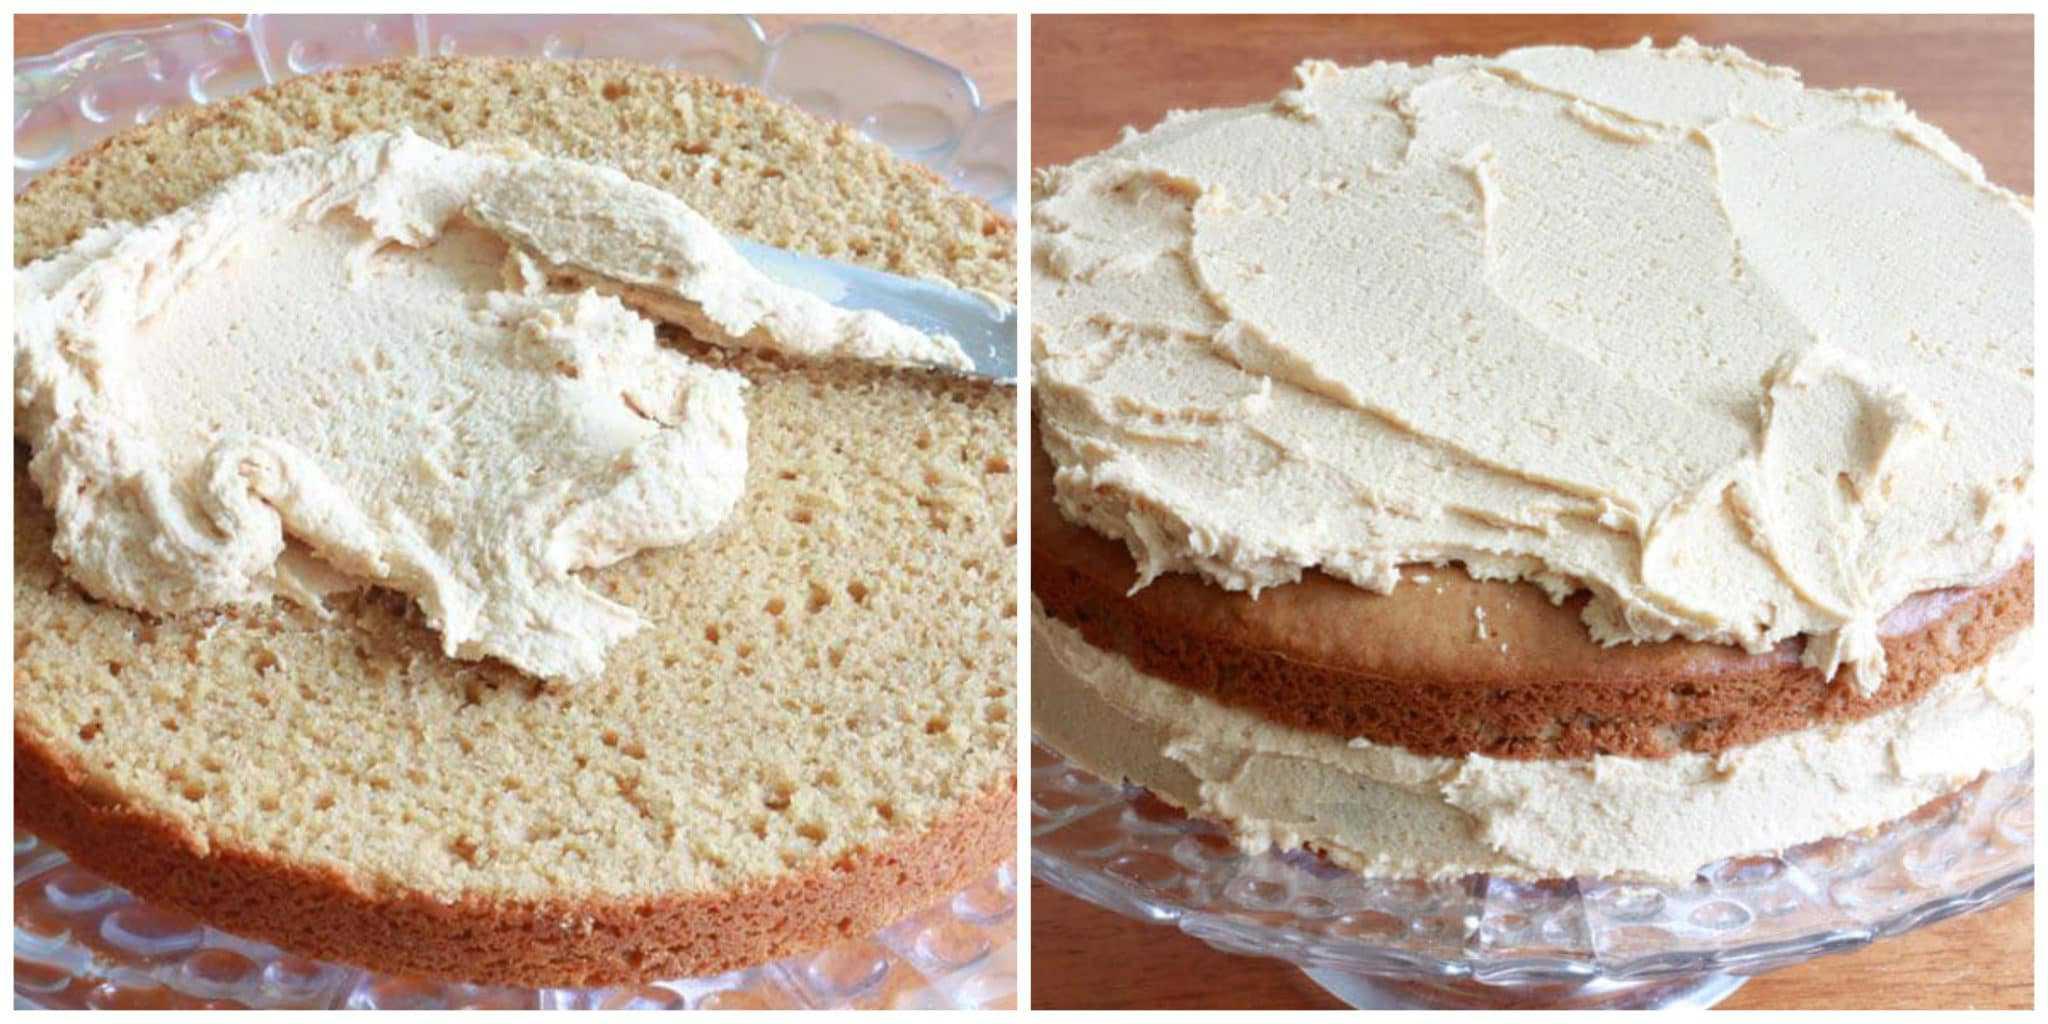 peanut butter cake recipe best ever